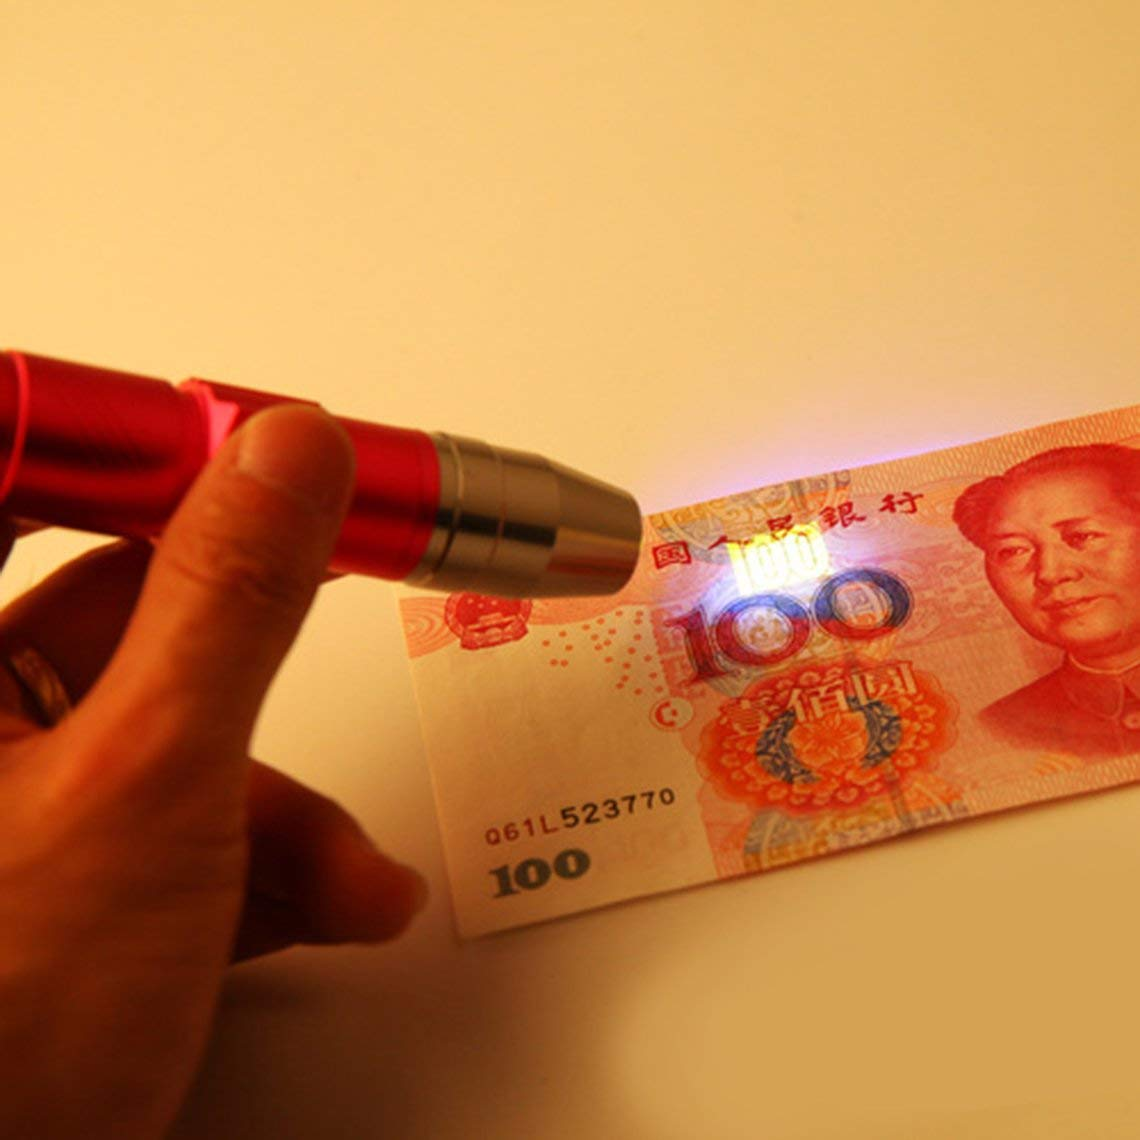 Mini LED Flashlight 365nm Inspection Lamp USB Charge UV Torch Light